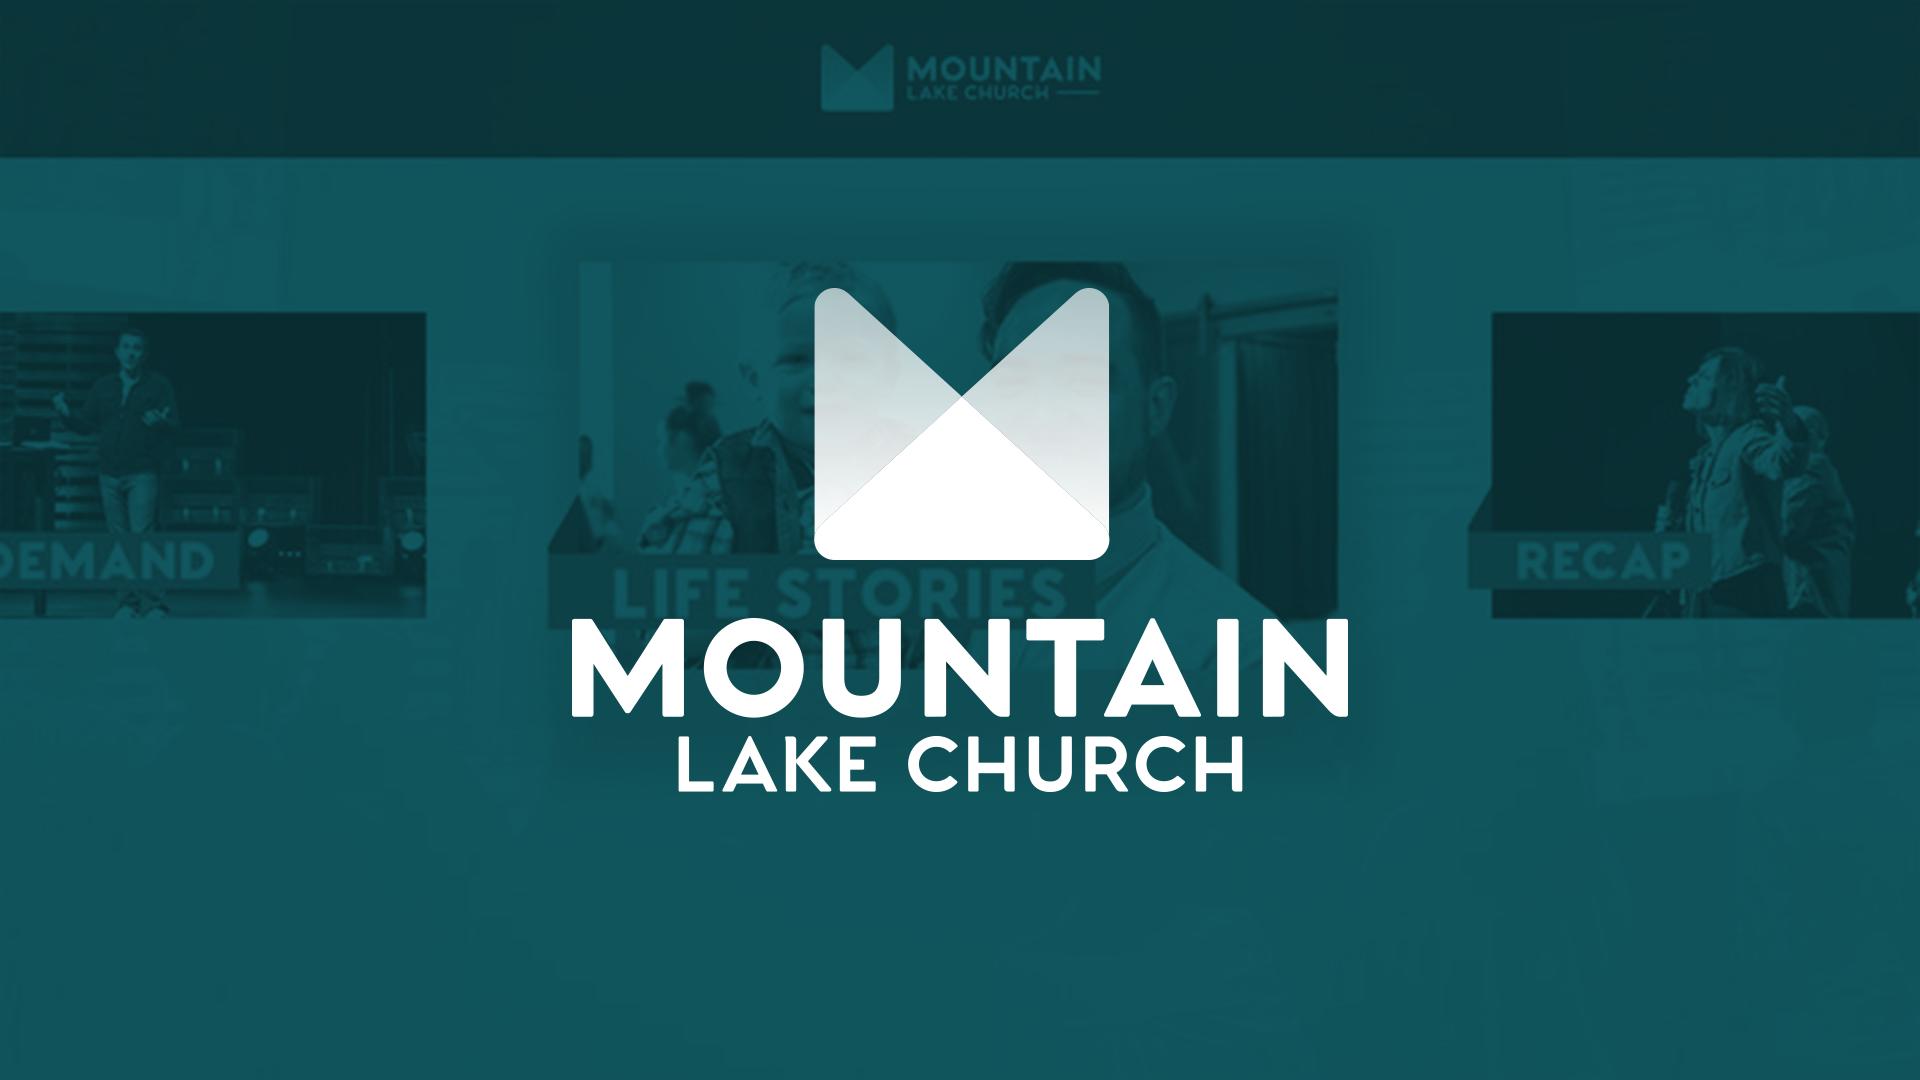 Mountain Lake Church